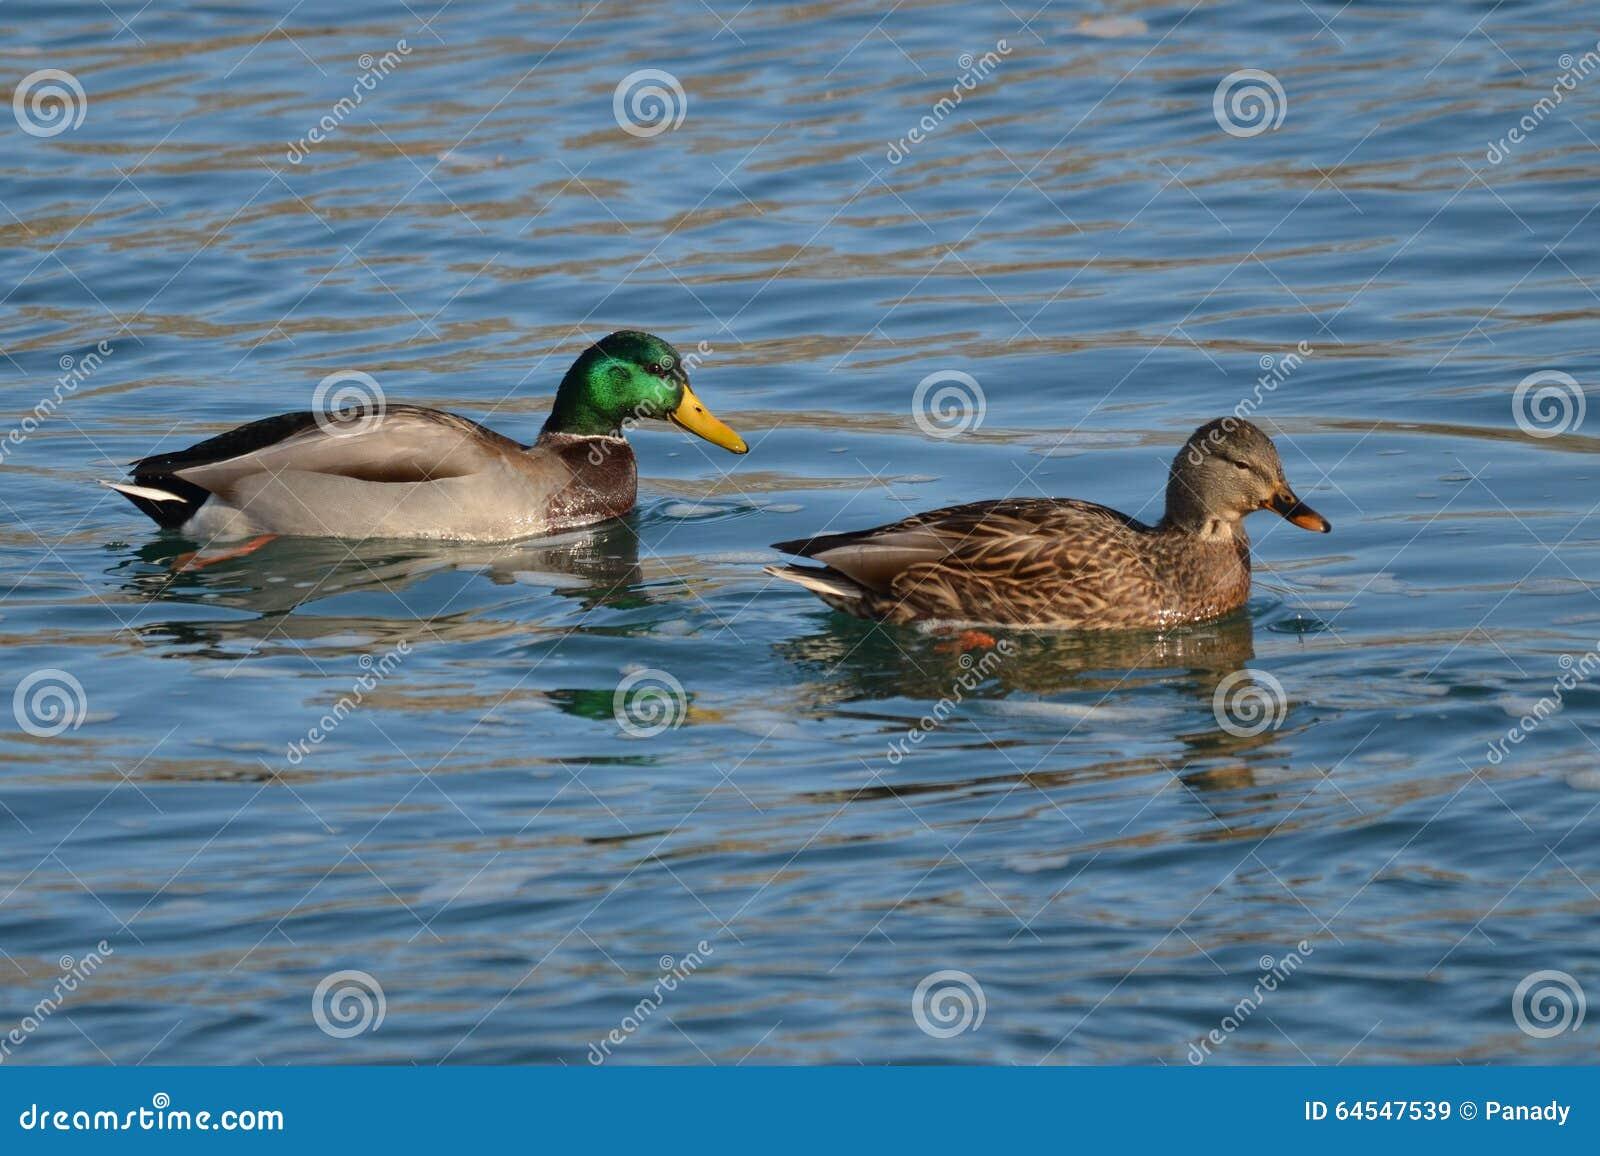 Male and female mallard duck - photo#23